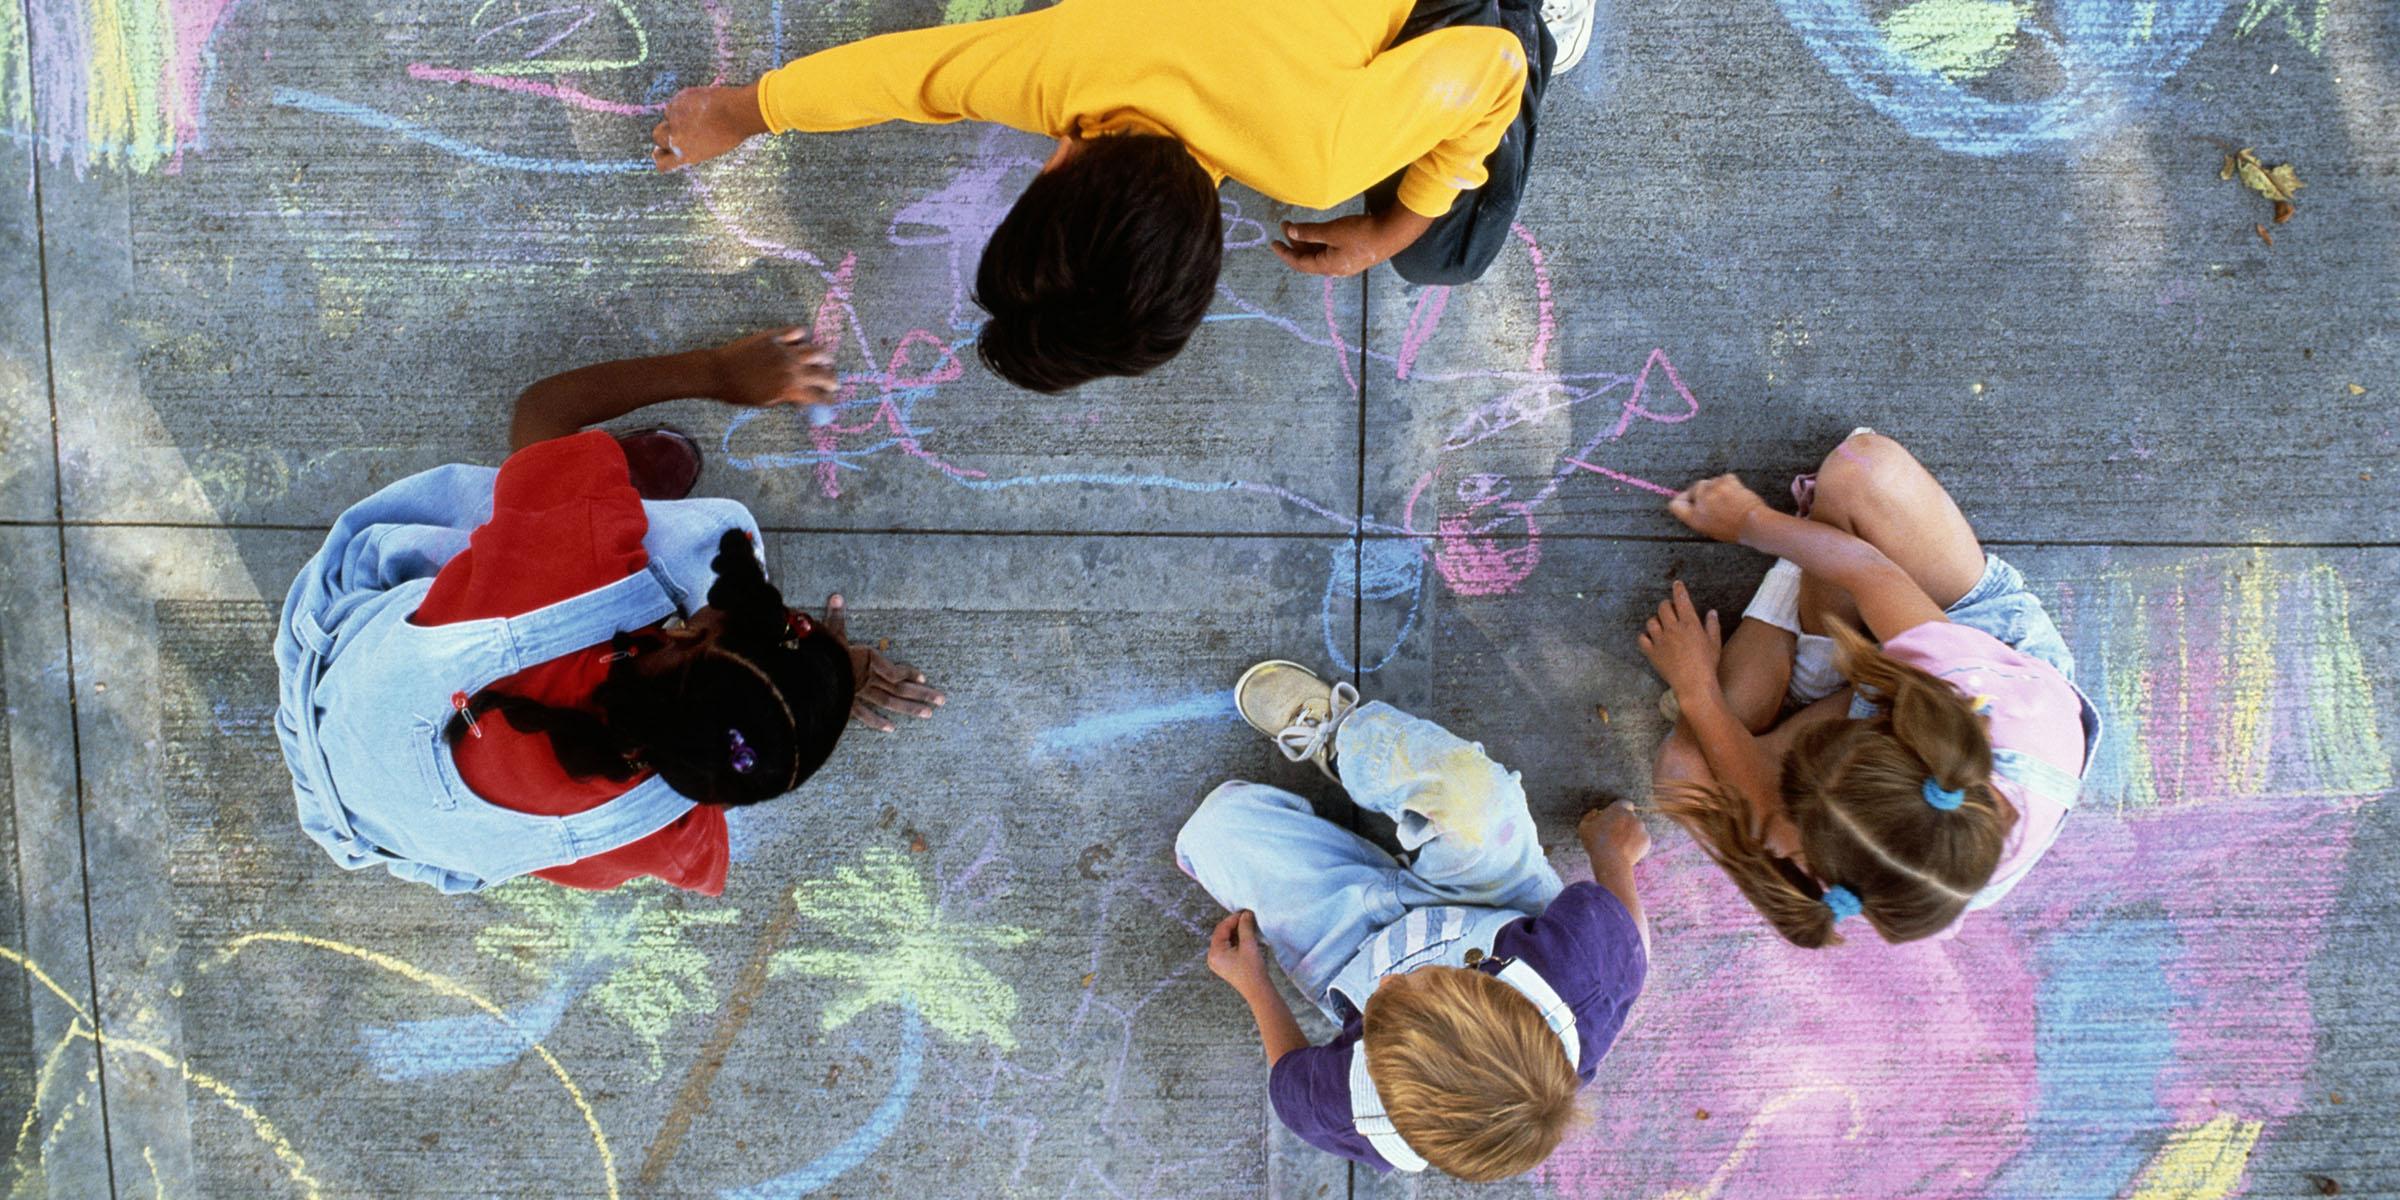 Teaching kids to respect diversity